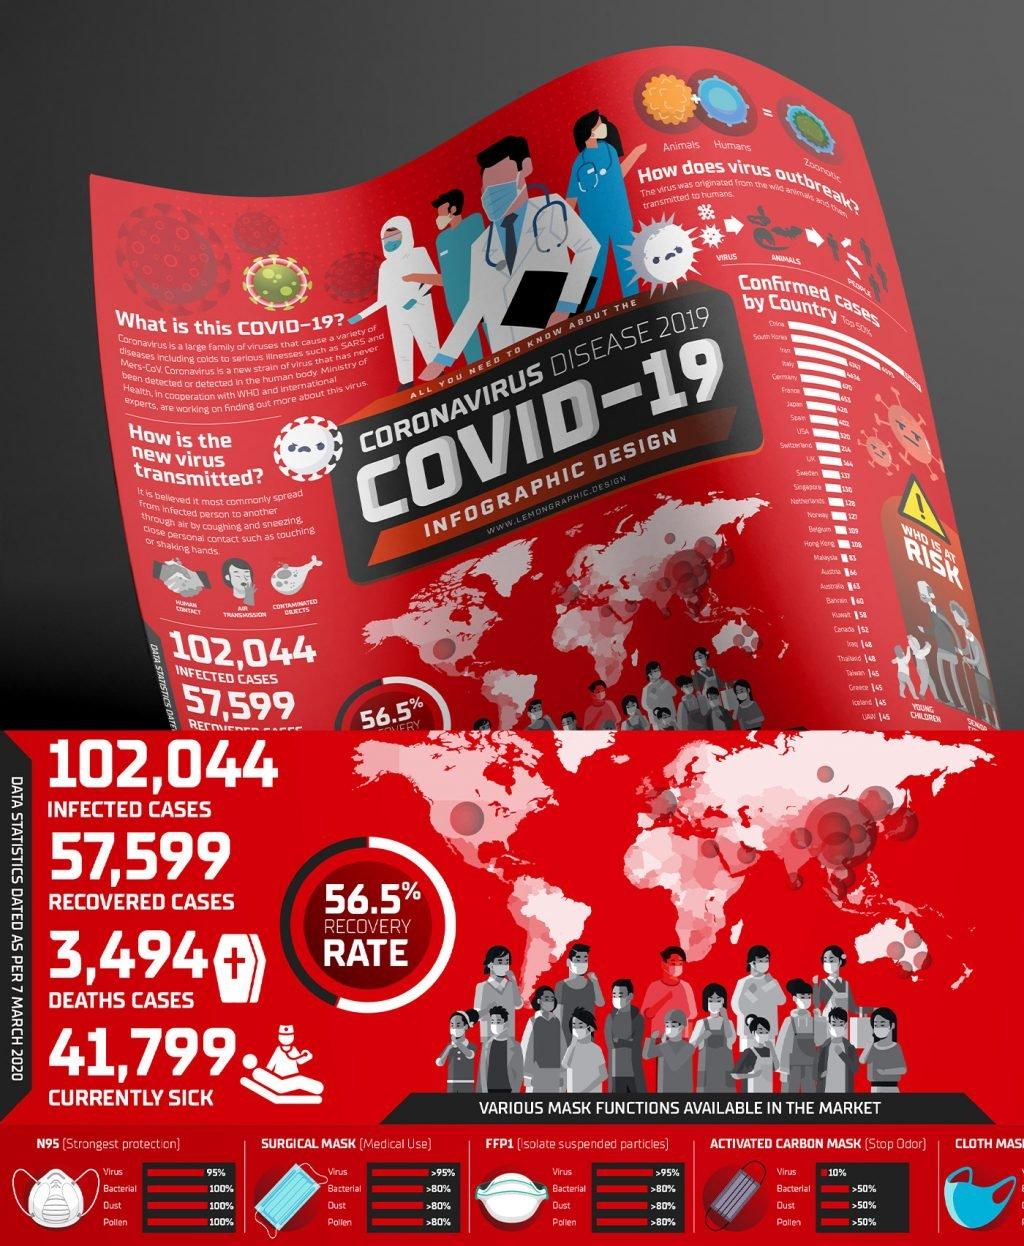 Coronavirus Disease 2020 in Graphic Design: Infographics, PPT Templates, Graphic Elements, Mask Designs - bc6a5f92428315.5e62fcc45bc9e